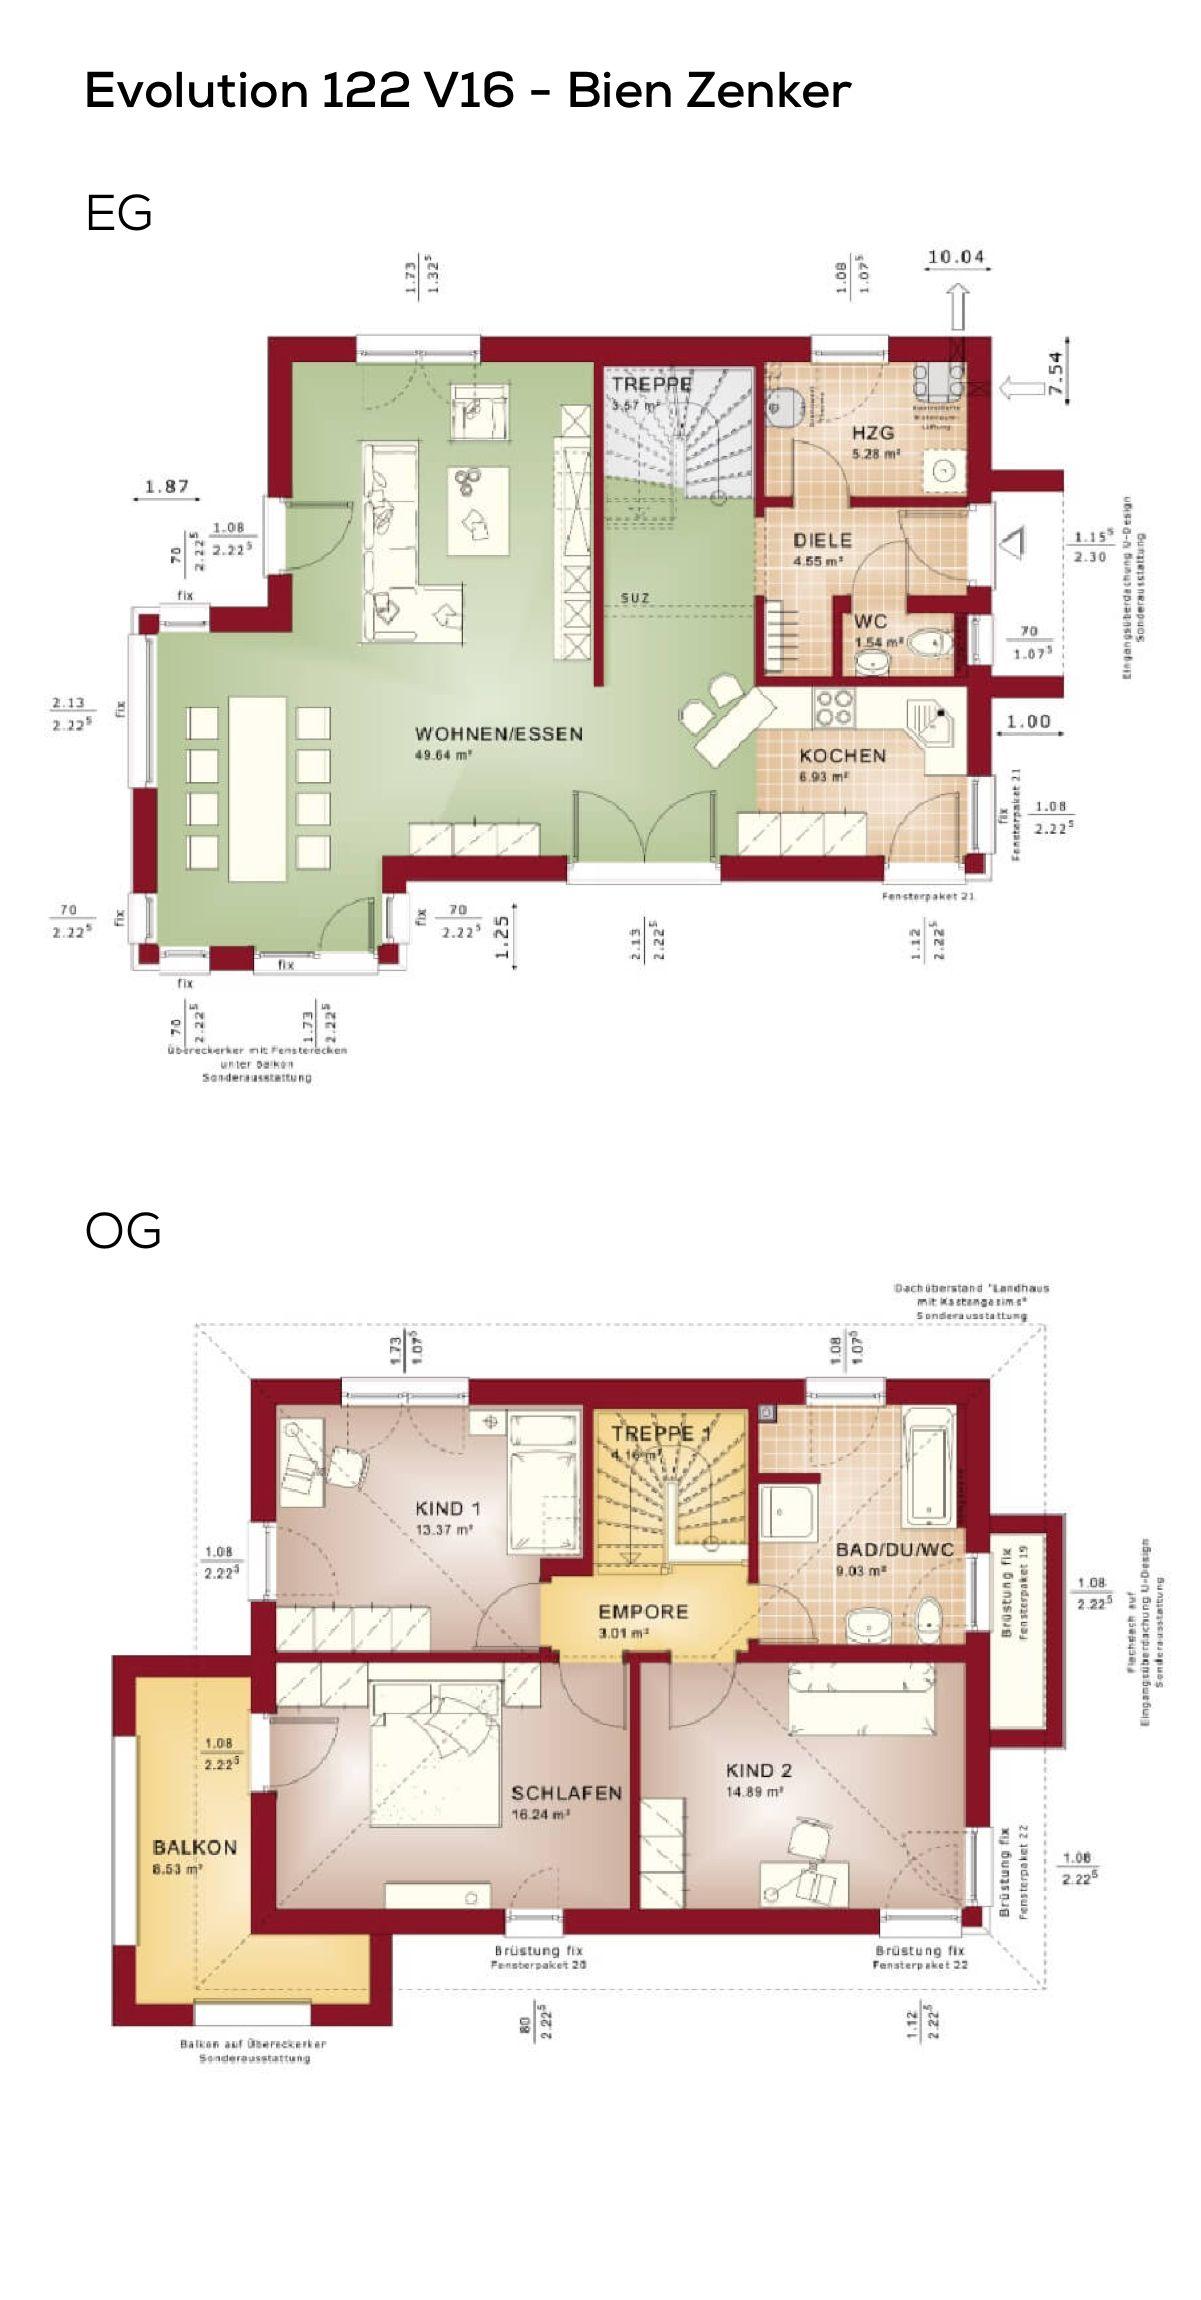 grundriss stadtvilla haus mit erker anbau 4 zimmer 122 qm wohnfl che erdgeschoss offene. Black Bedroom Furniture Sets. Home Design Ideas